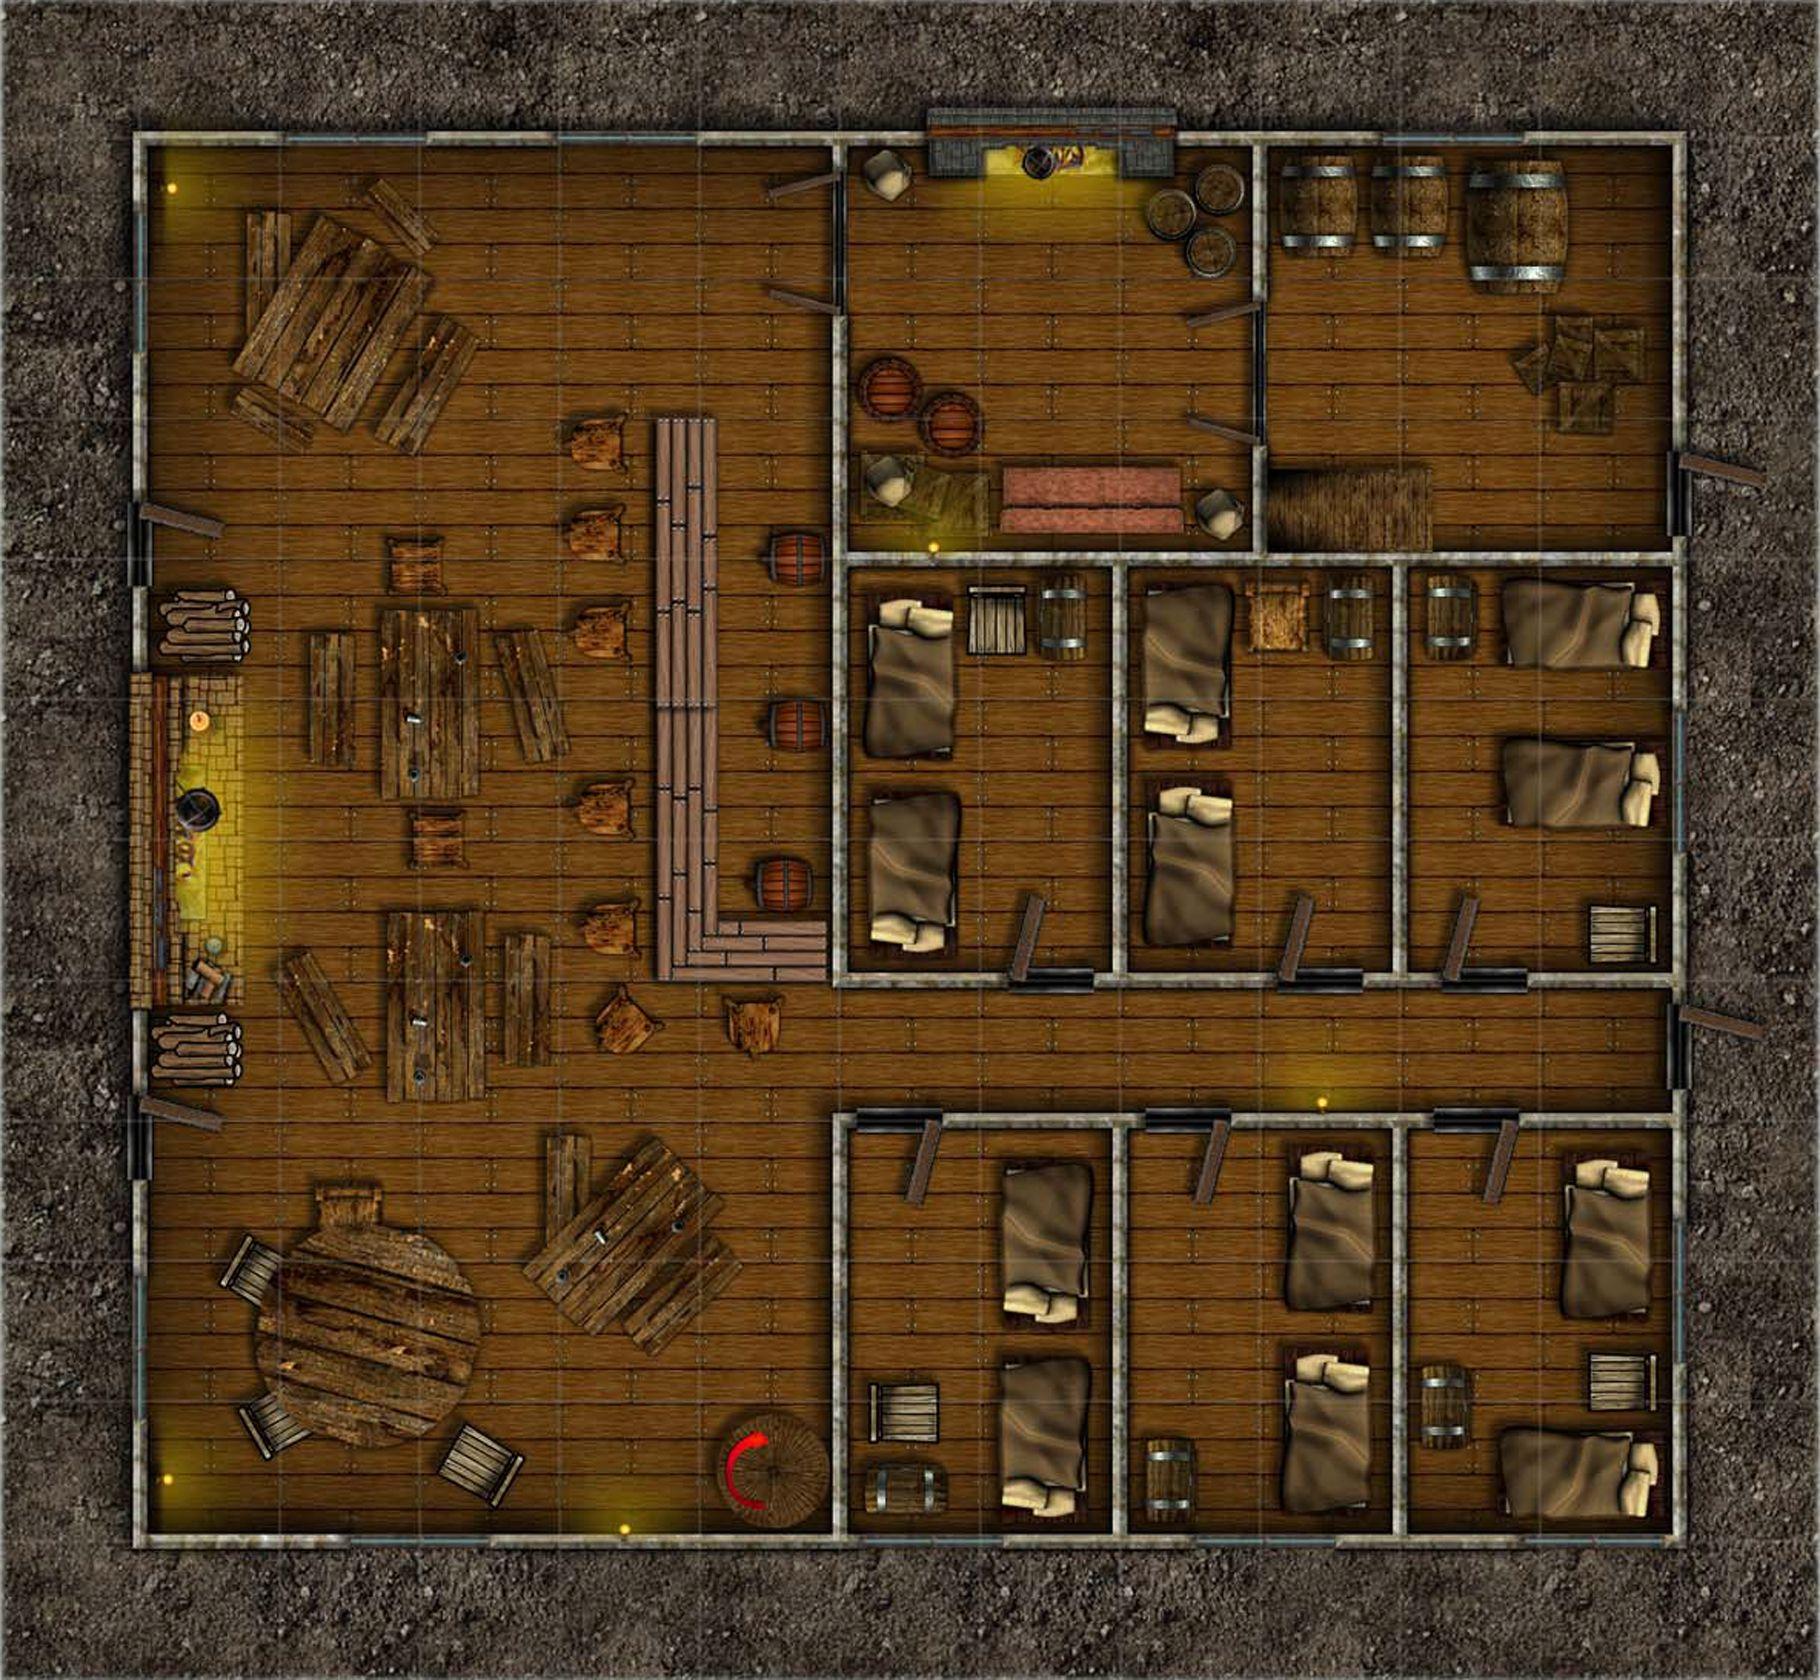 How To Plan Floor Tile Layout Wrafton S Inn Maps Pinterest Rpg Fantasy Map And